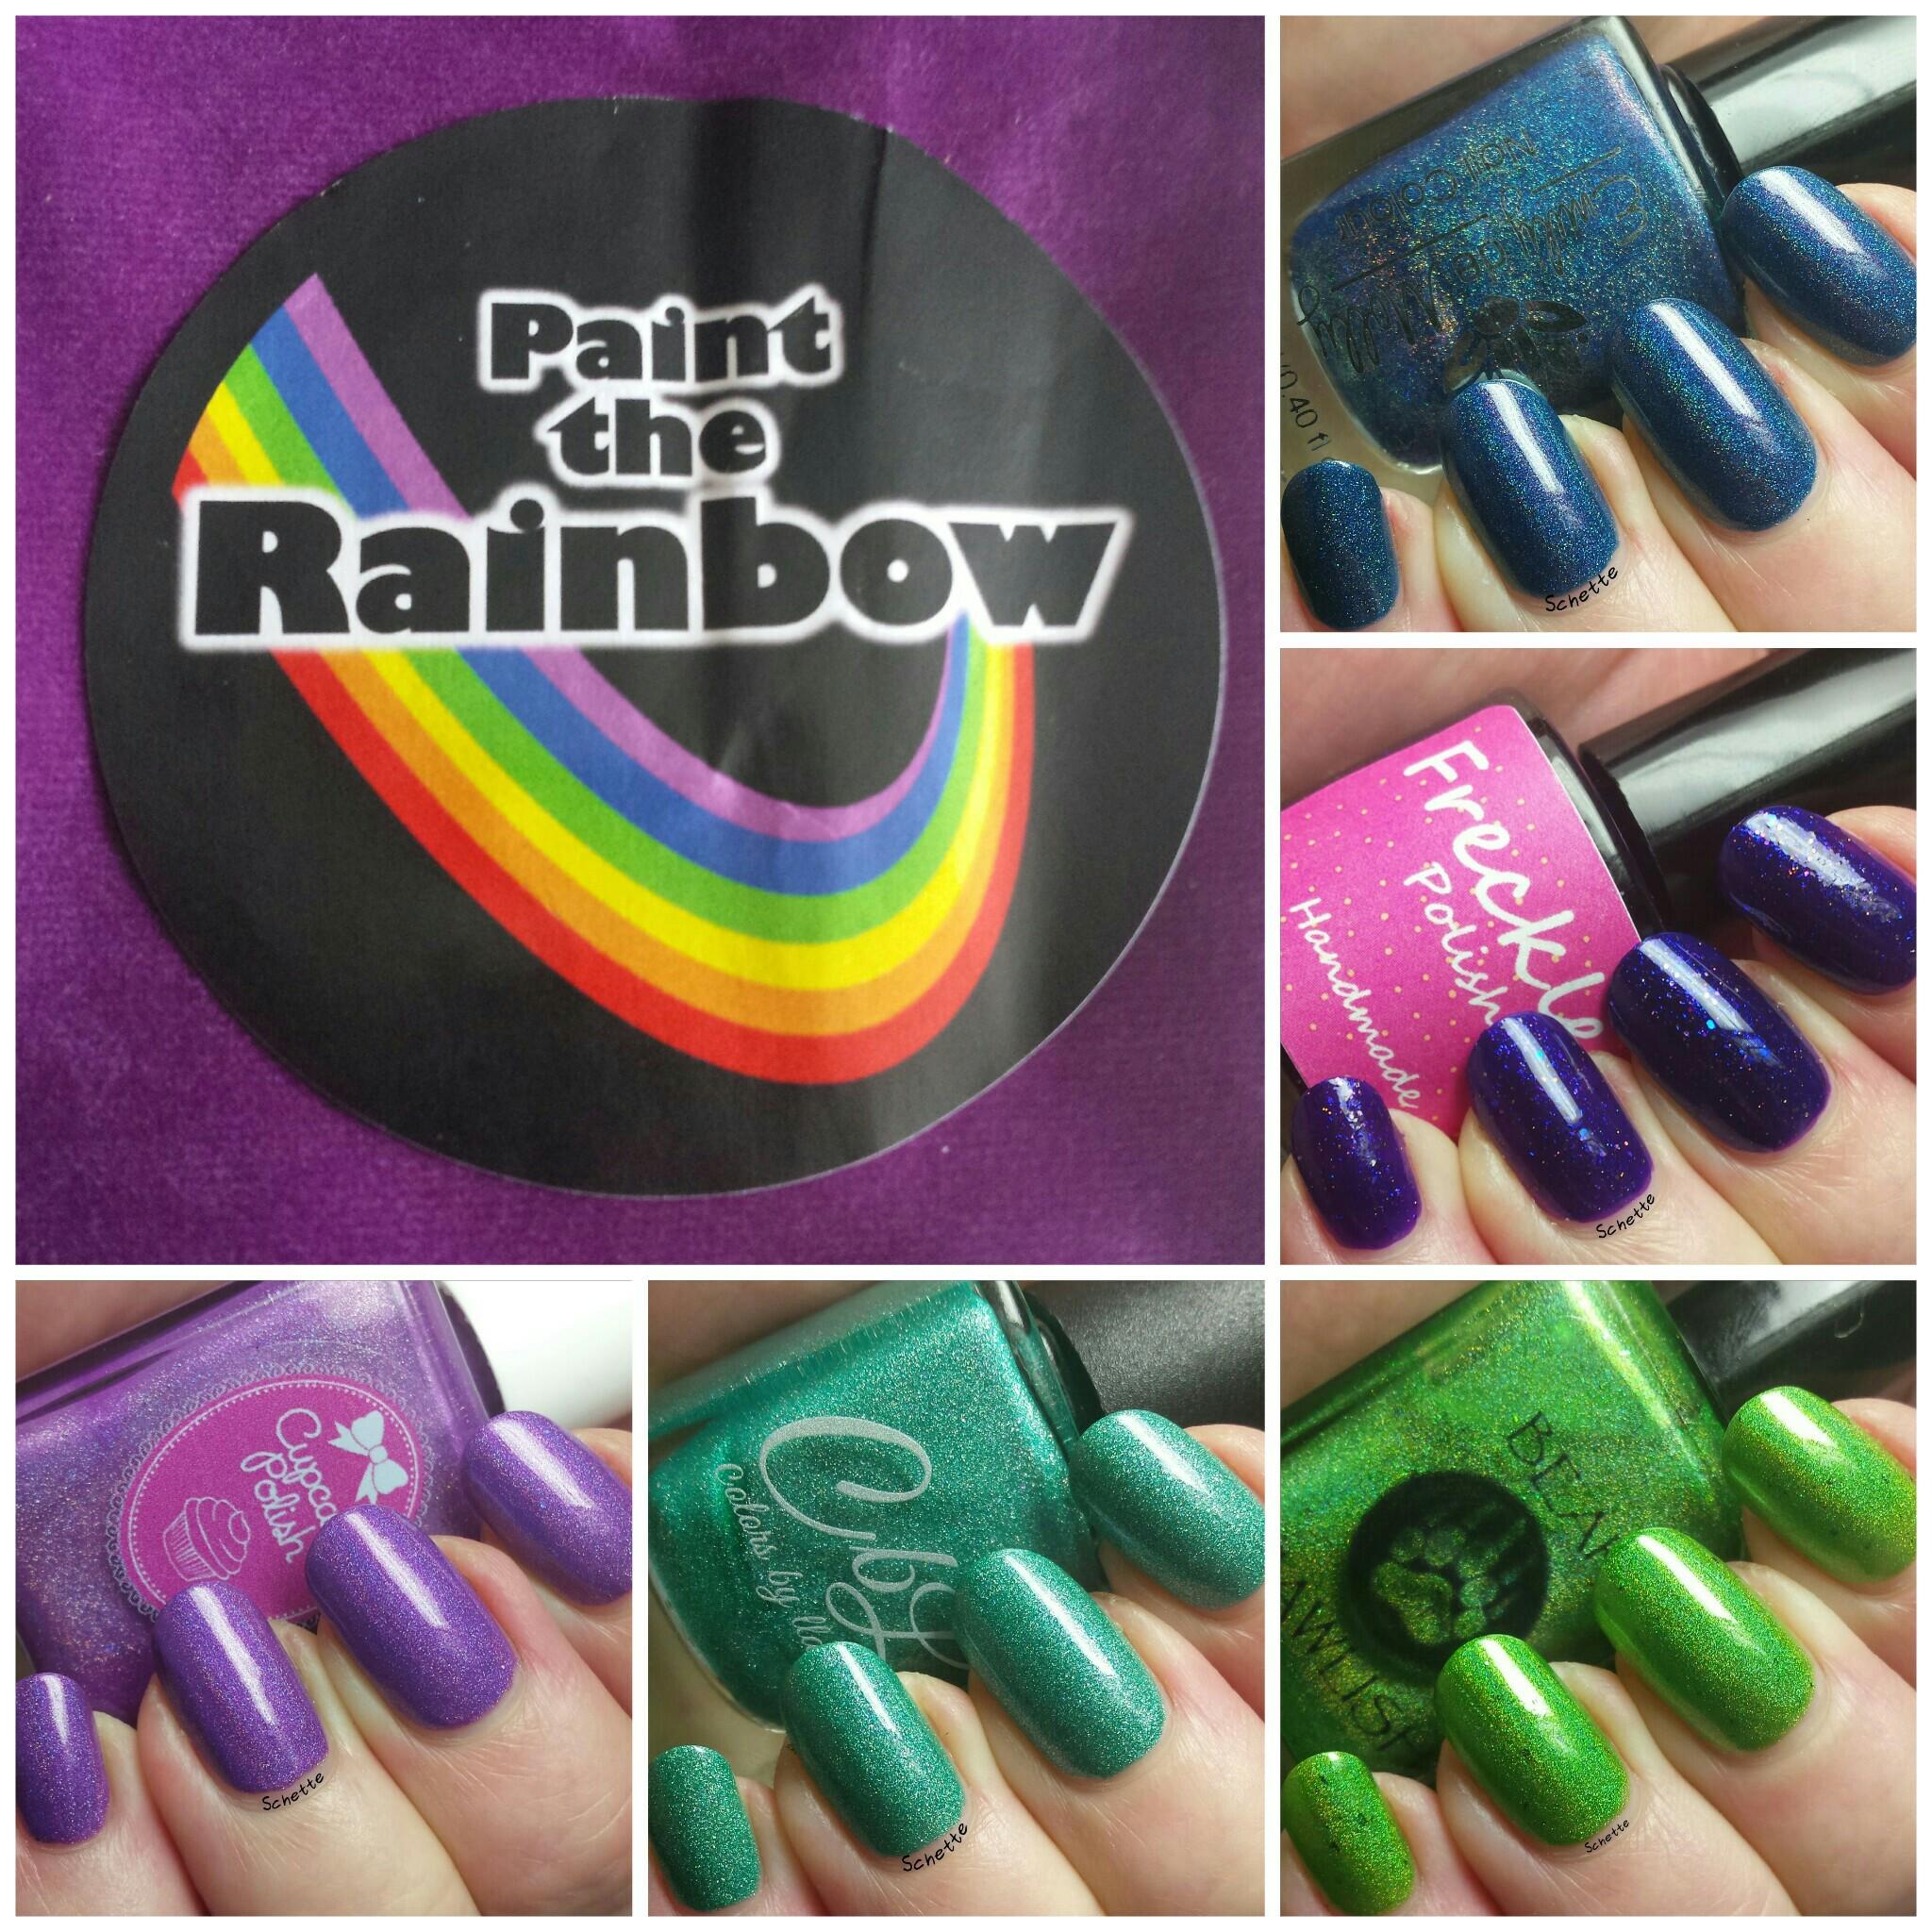 Paint the Rainbow Box : November 2015 - Disney Vilains